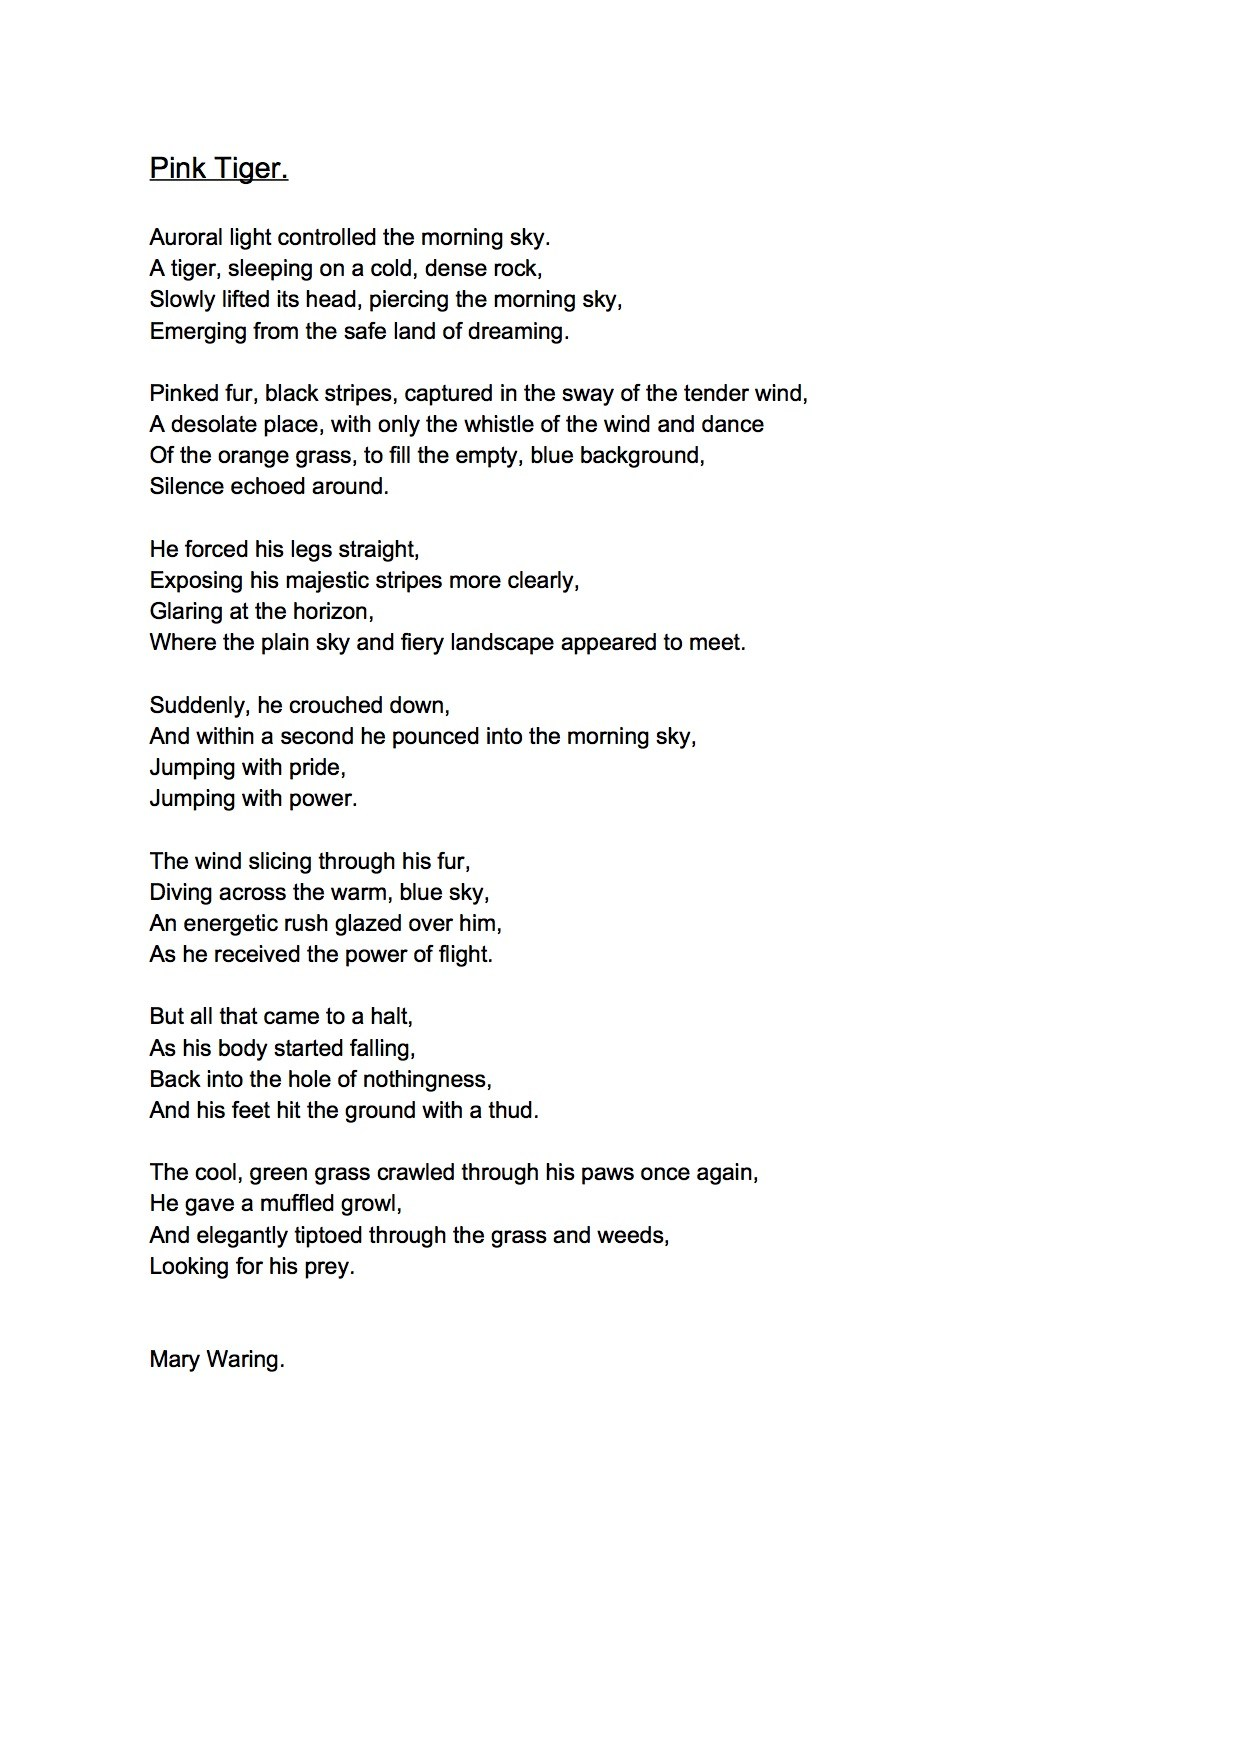 Reflective essay nursing practice